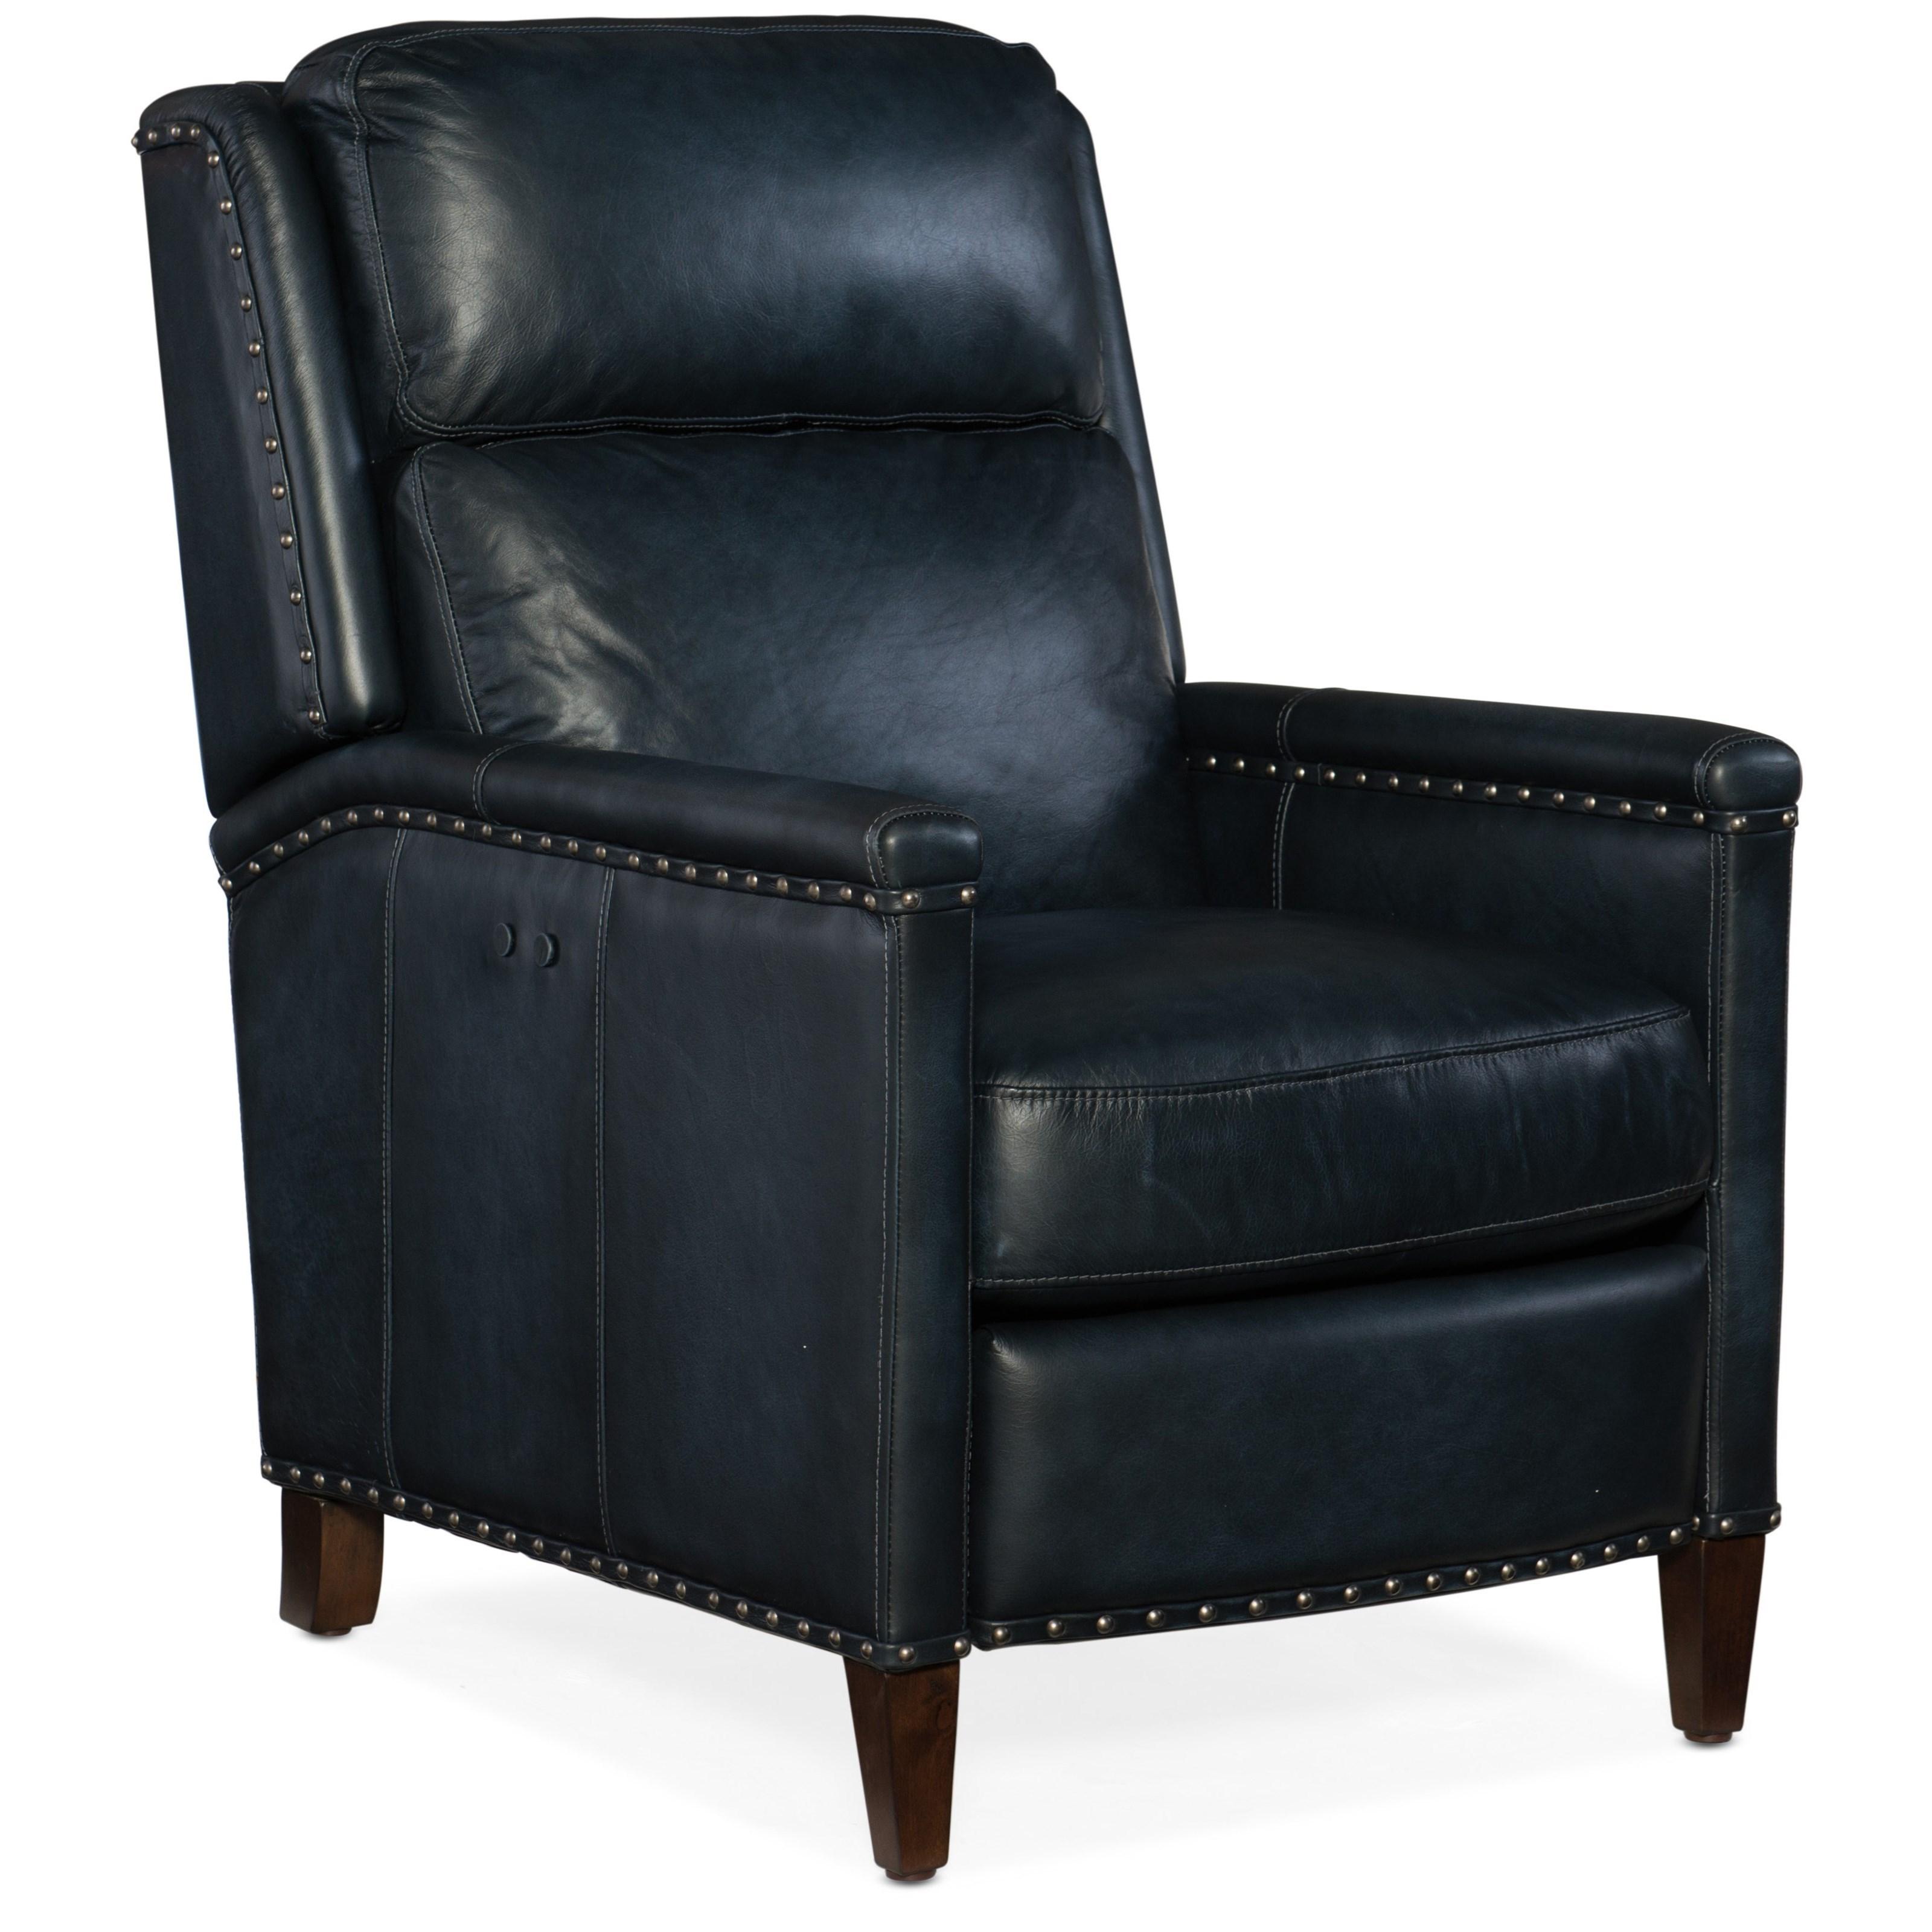 Hooker Furniture Reclining Chairs Zen Transitional Power Recliner With  Nailhead Trim